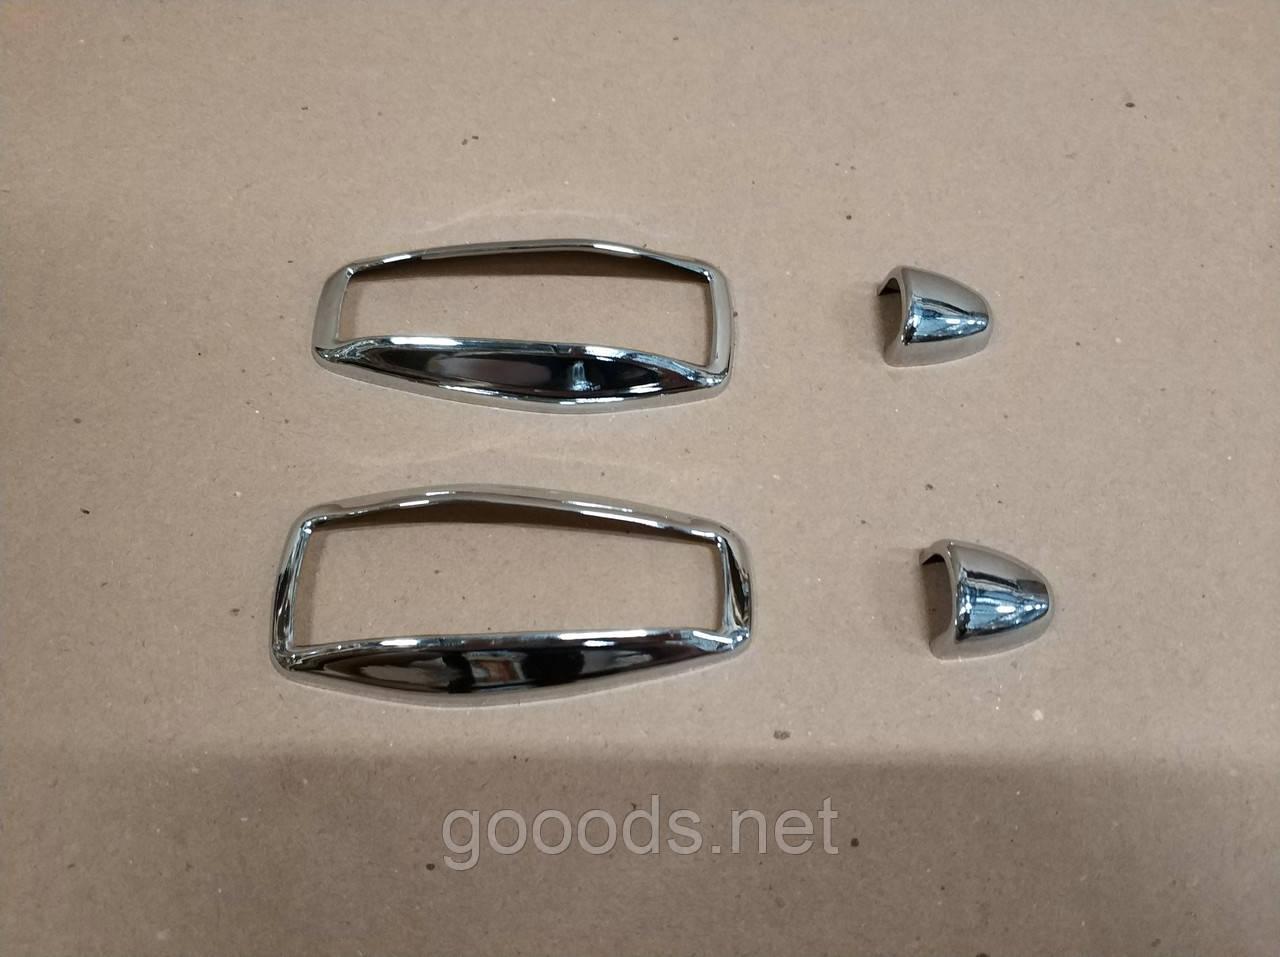 Хром окантовка на повторители поворота и омыватели Hyundai Tucson